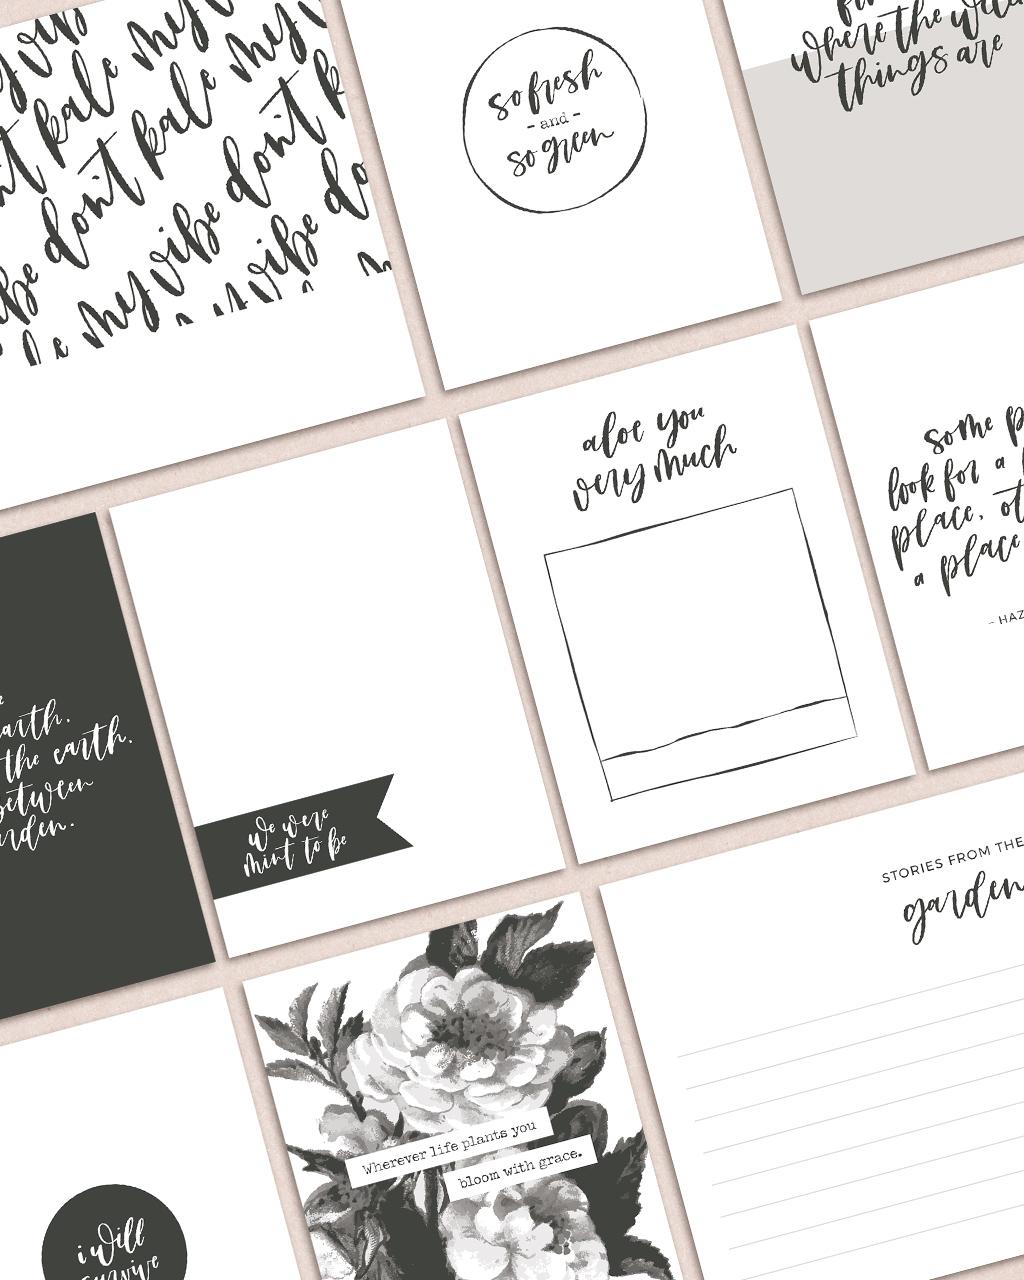 Garden Party Free Digital Scrapbook Pocket Cards - Sahin Designs